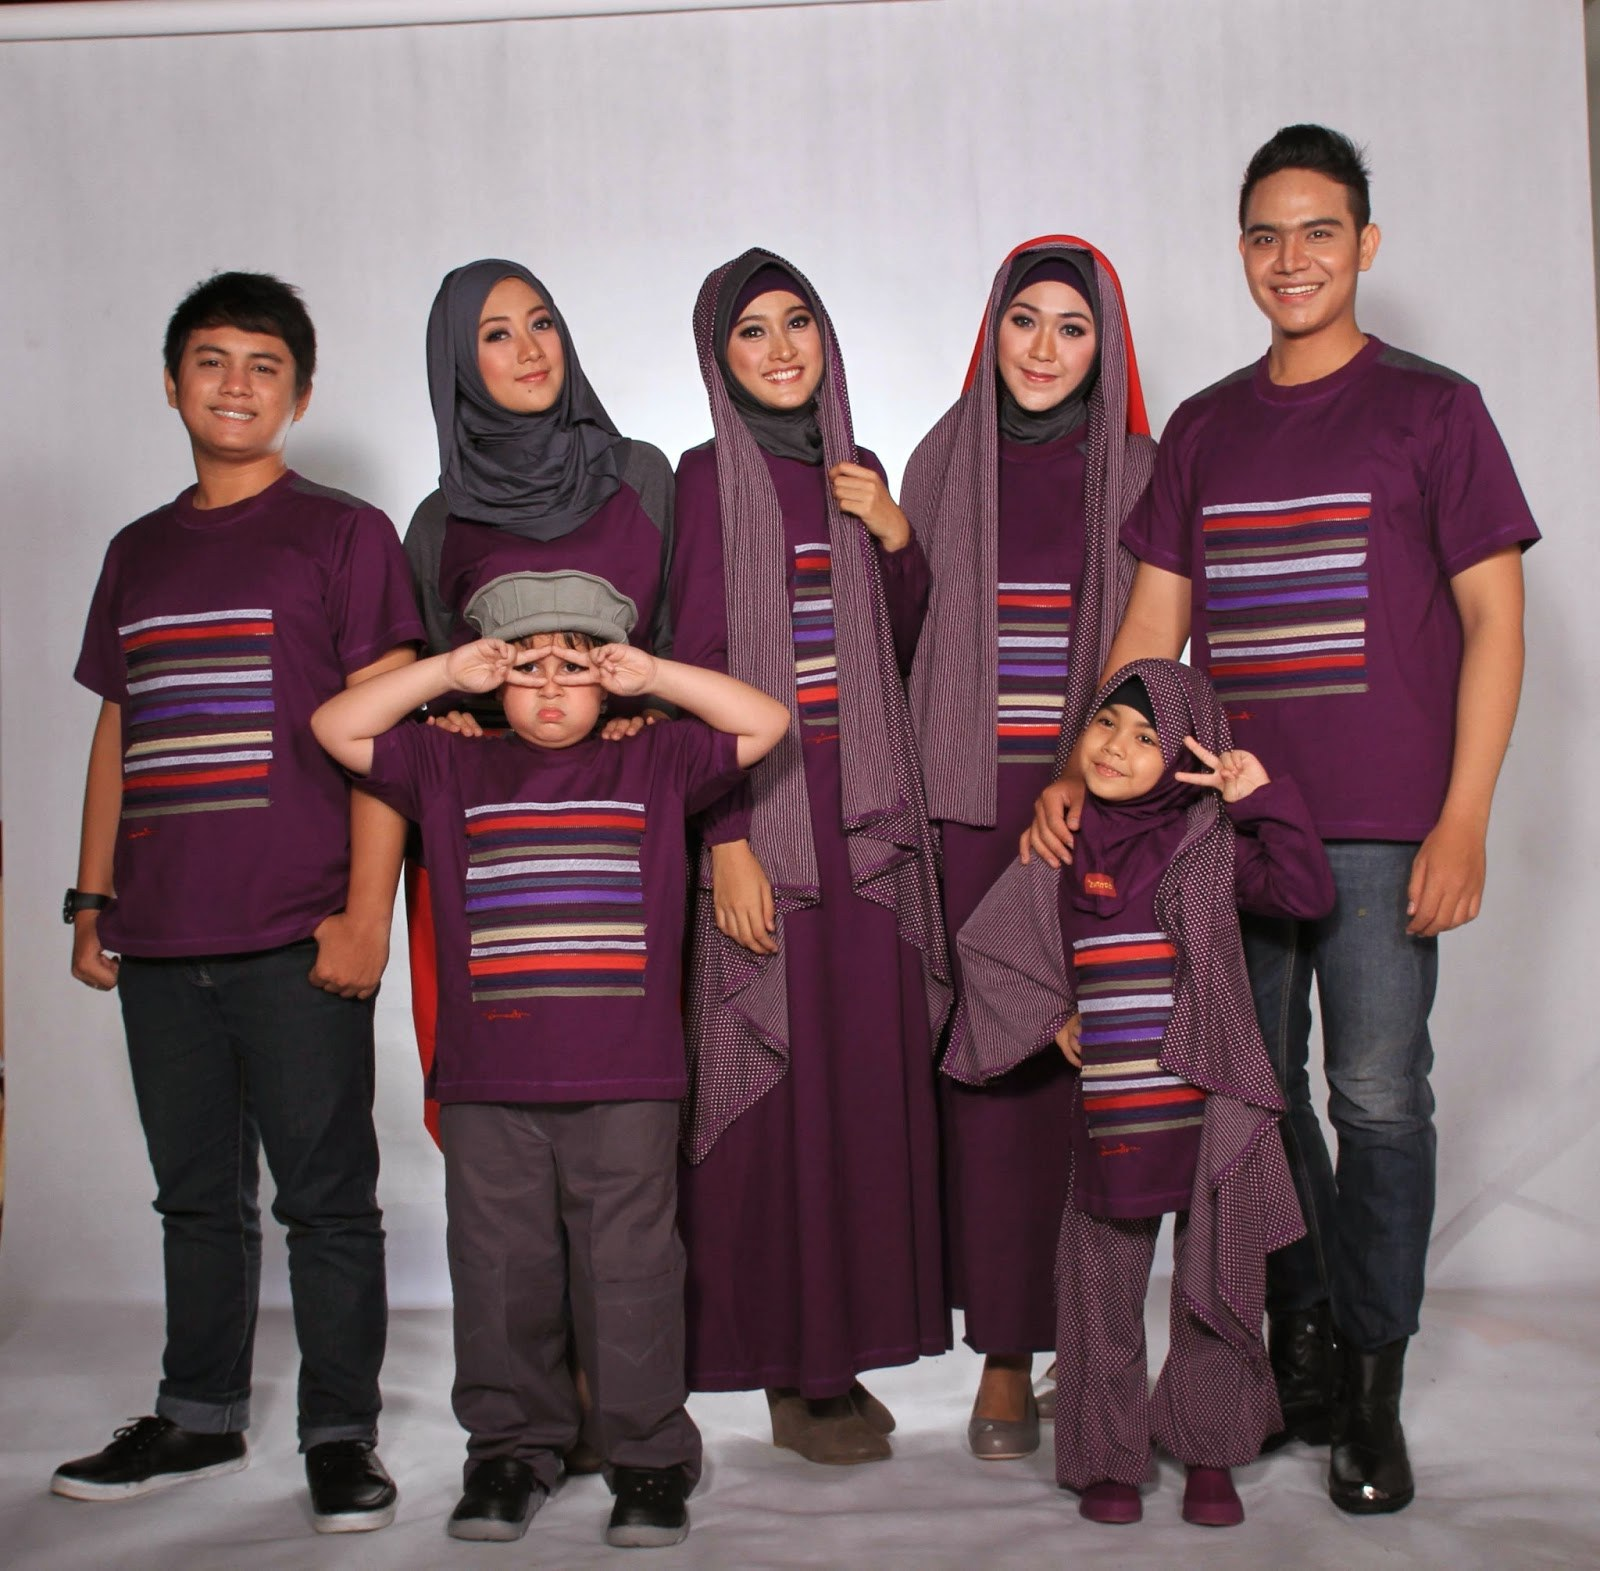 Design Baju Lebaran Seragam U3dh 25 Model Baju Lebaran Keluarga 2018 Kompak & Modis